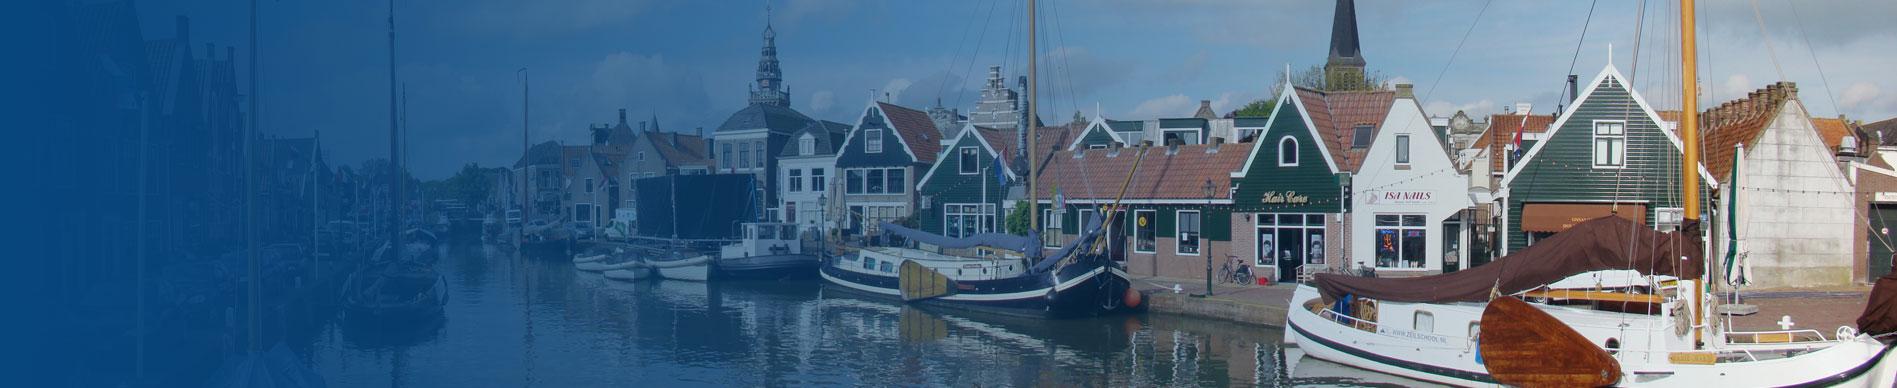 Slider-BG-Monnickendam